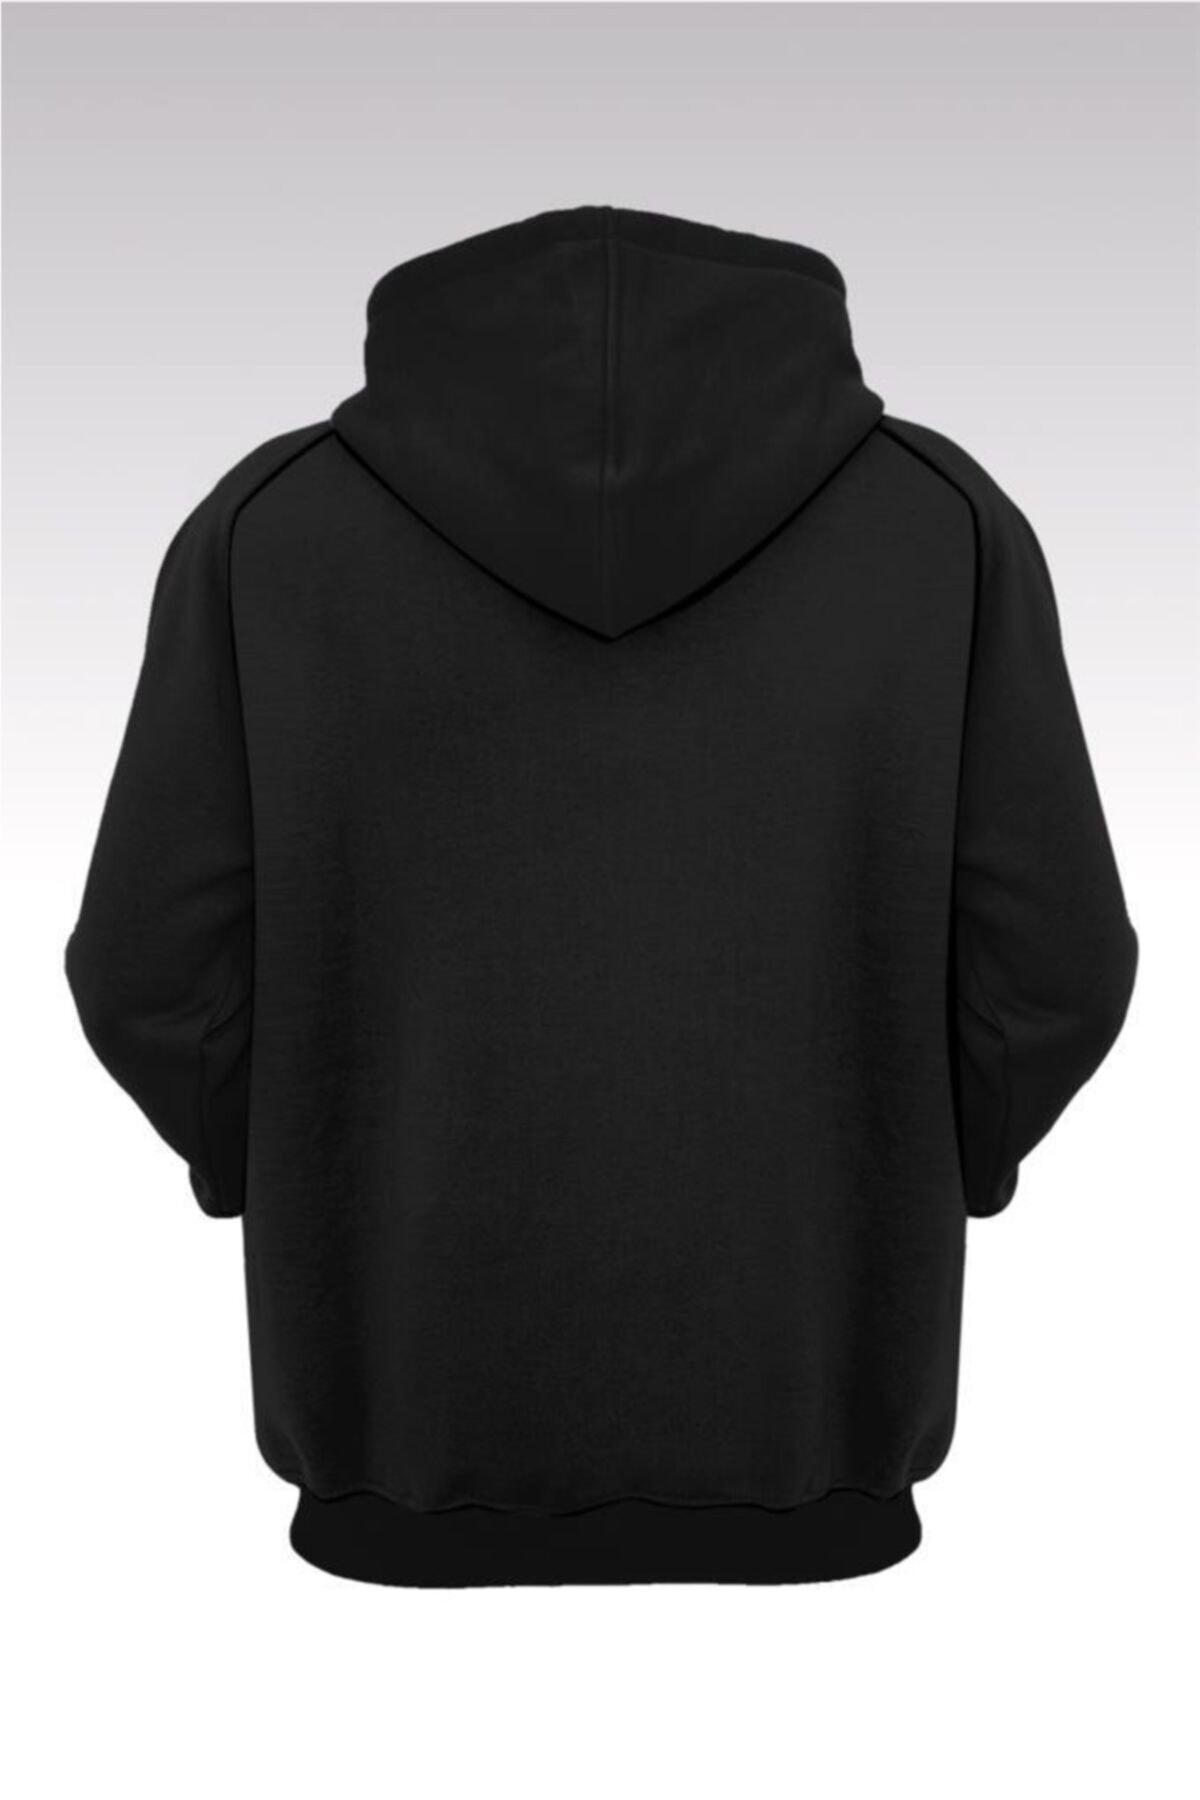 Tonny Mood Unisex Siyah Garibanın Yüzü Gülür Mü 206 Kapüşonlu Sweatshirt - Hoodie 2